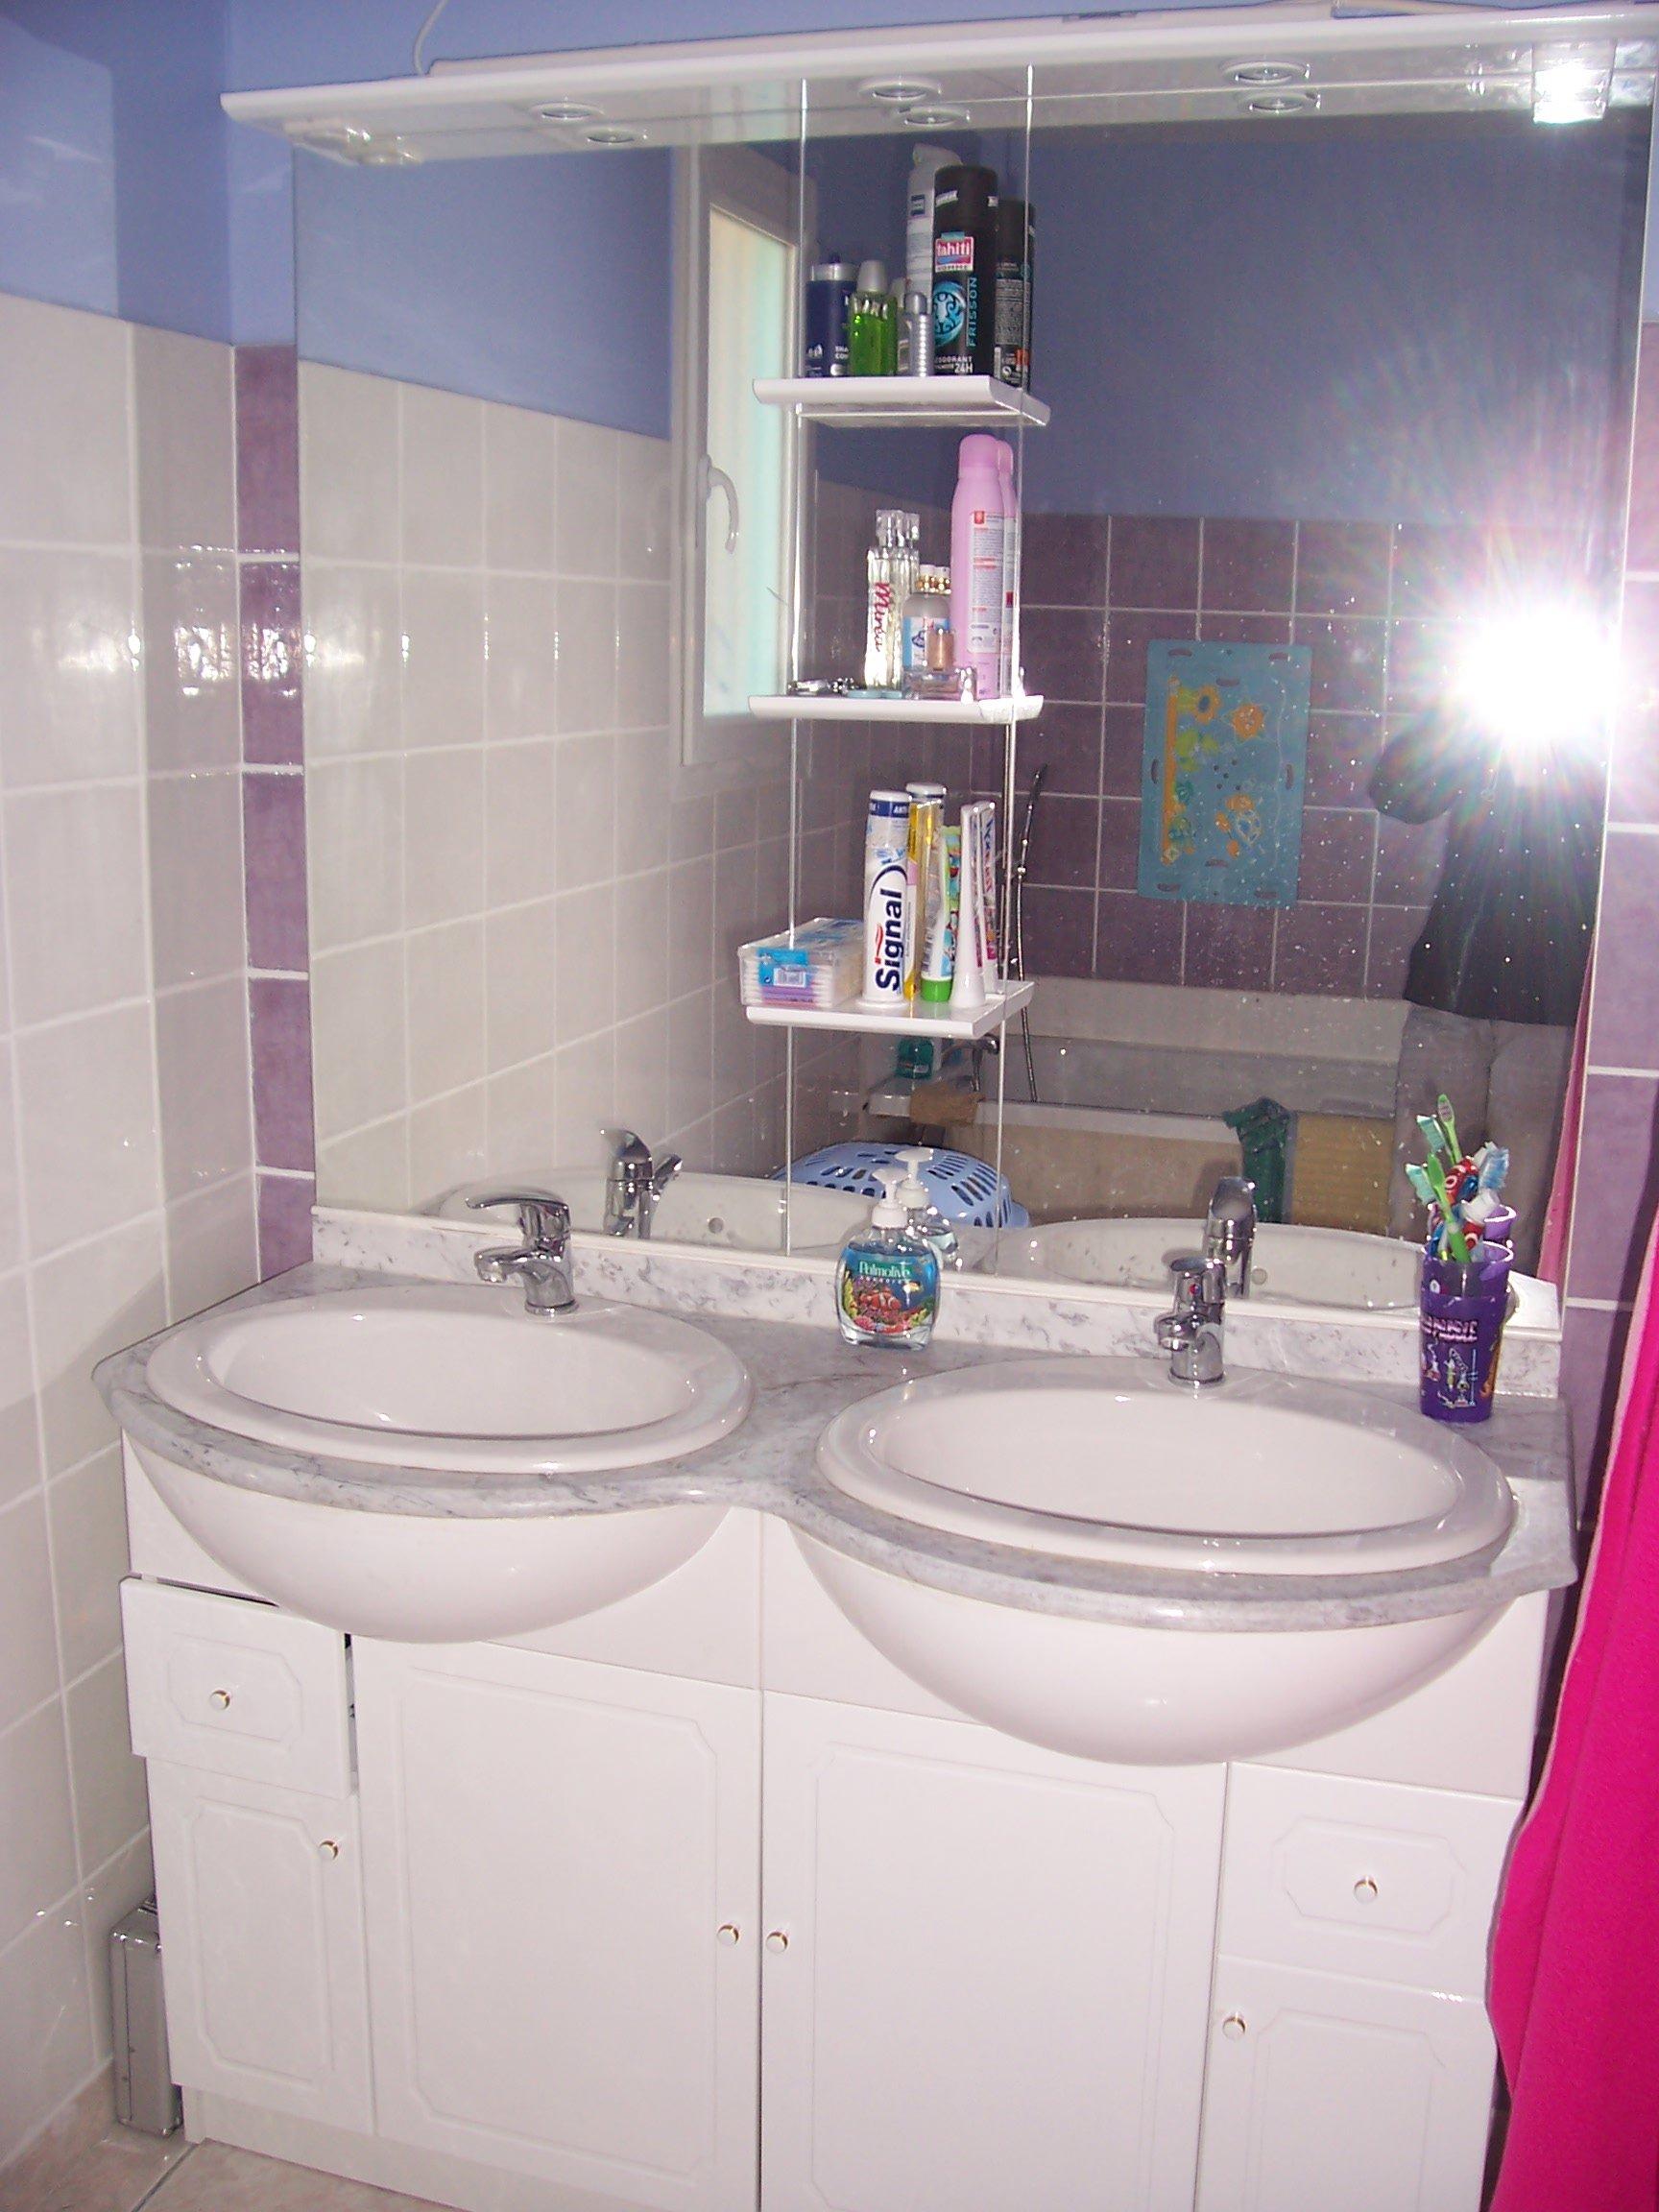 Meuble de salle de bain construction maison rnsoe - Construction salle de bain ...